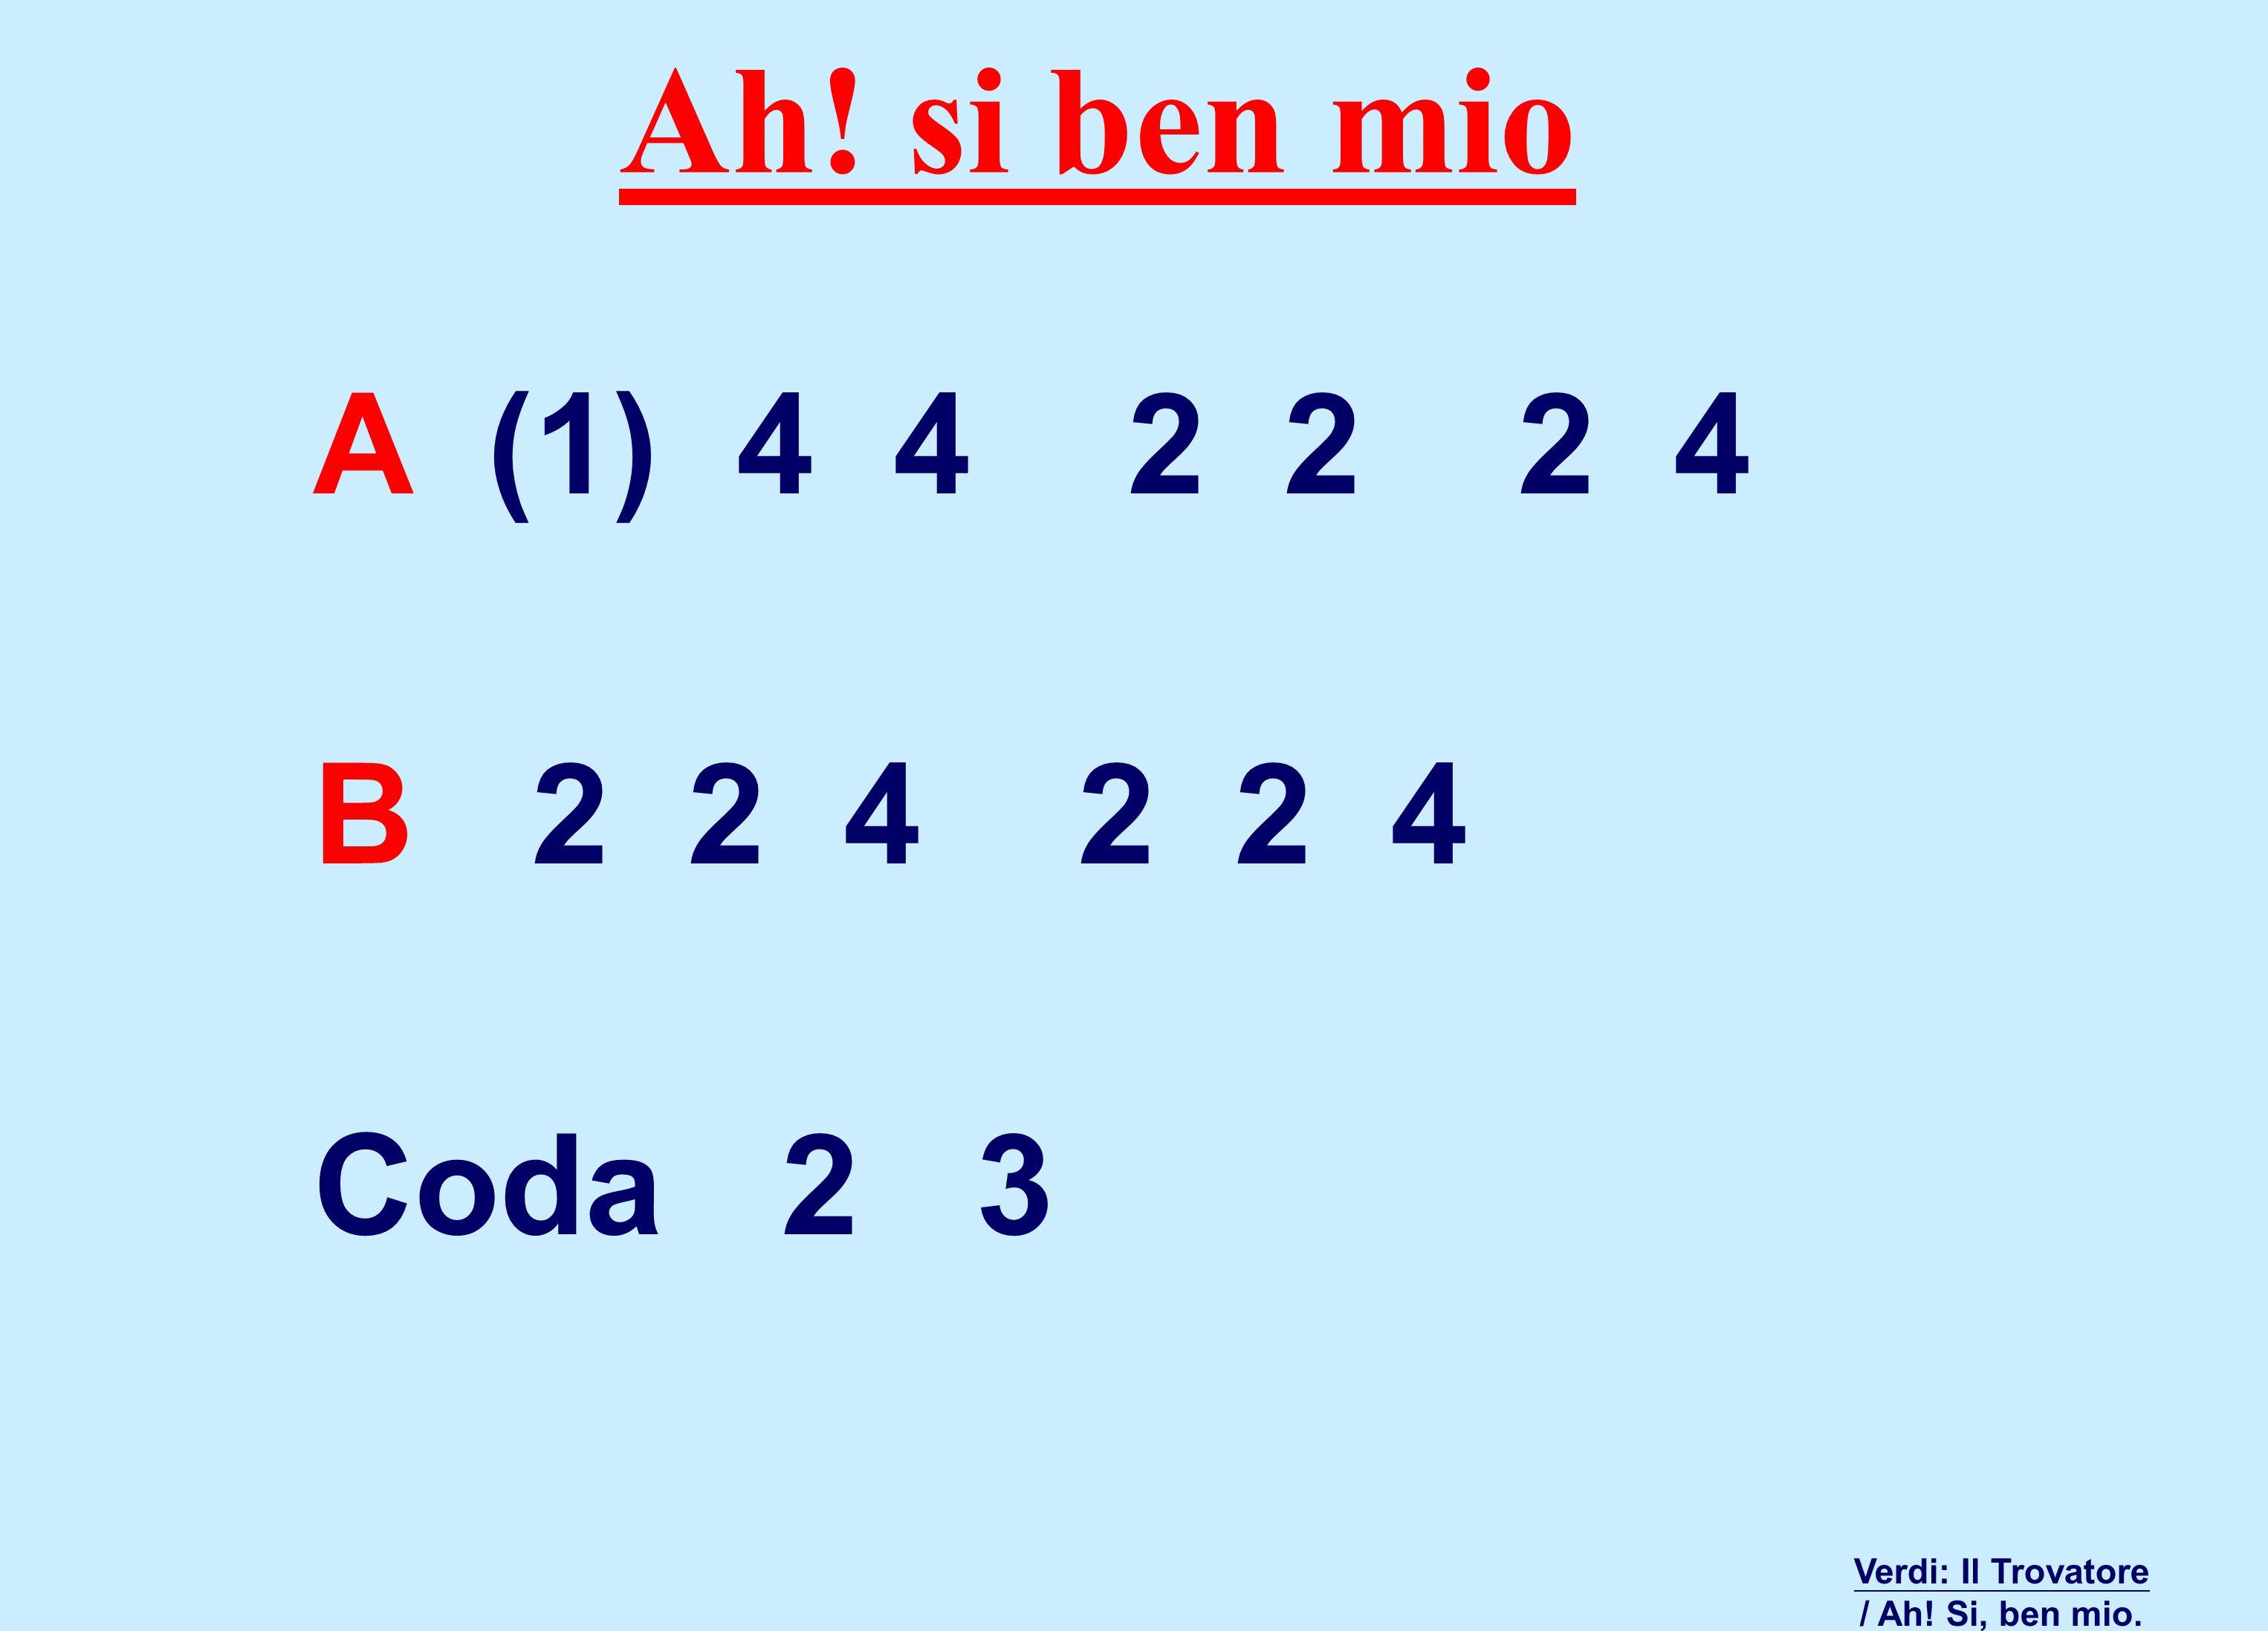 Ah! si ben mio Verdi: Il Trovatore / Ah! Si, ben mio. A (1) 4 4 2 2 2 4 B 2 2 4 2 2 4 Coda 2 3